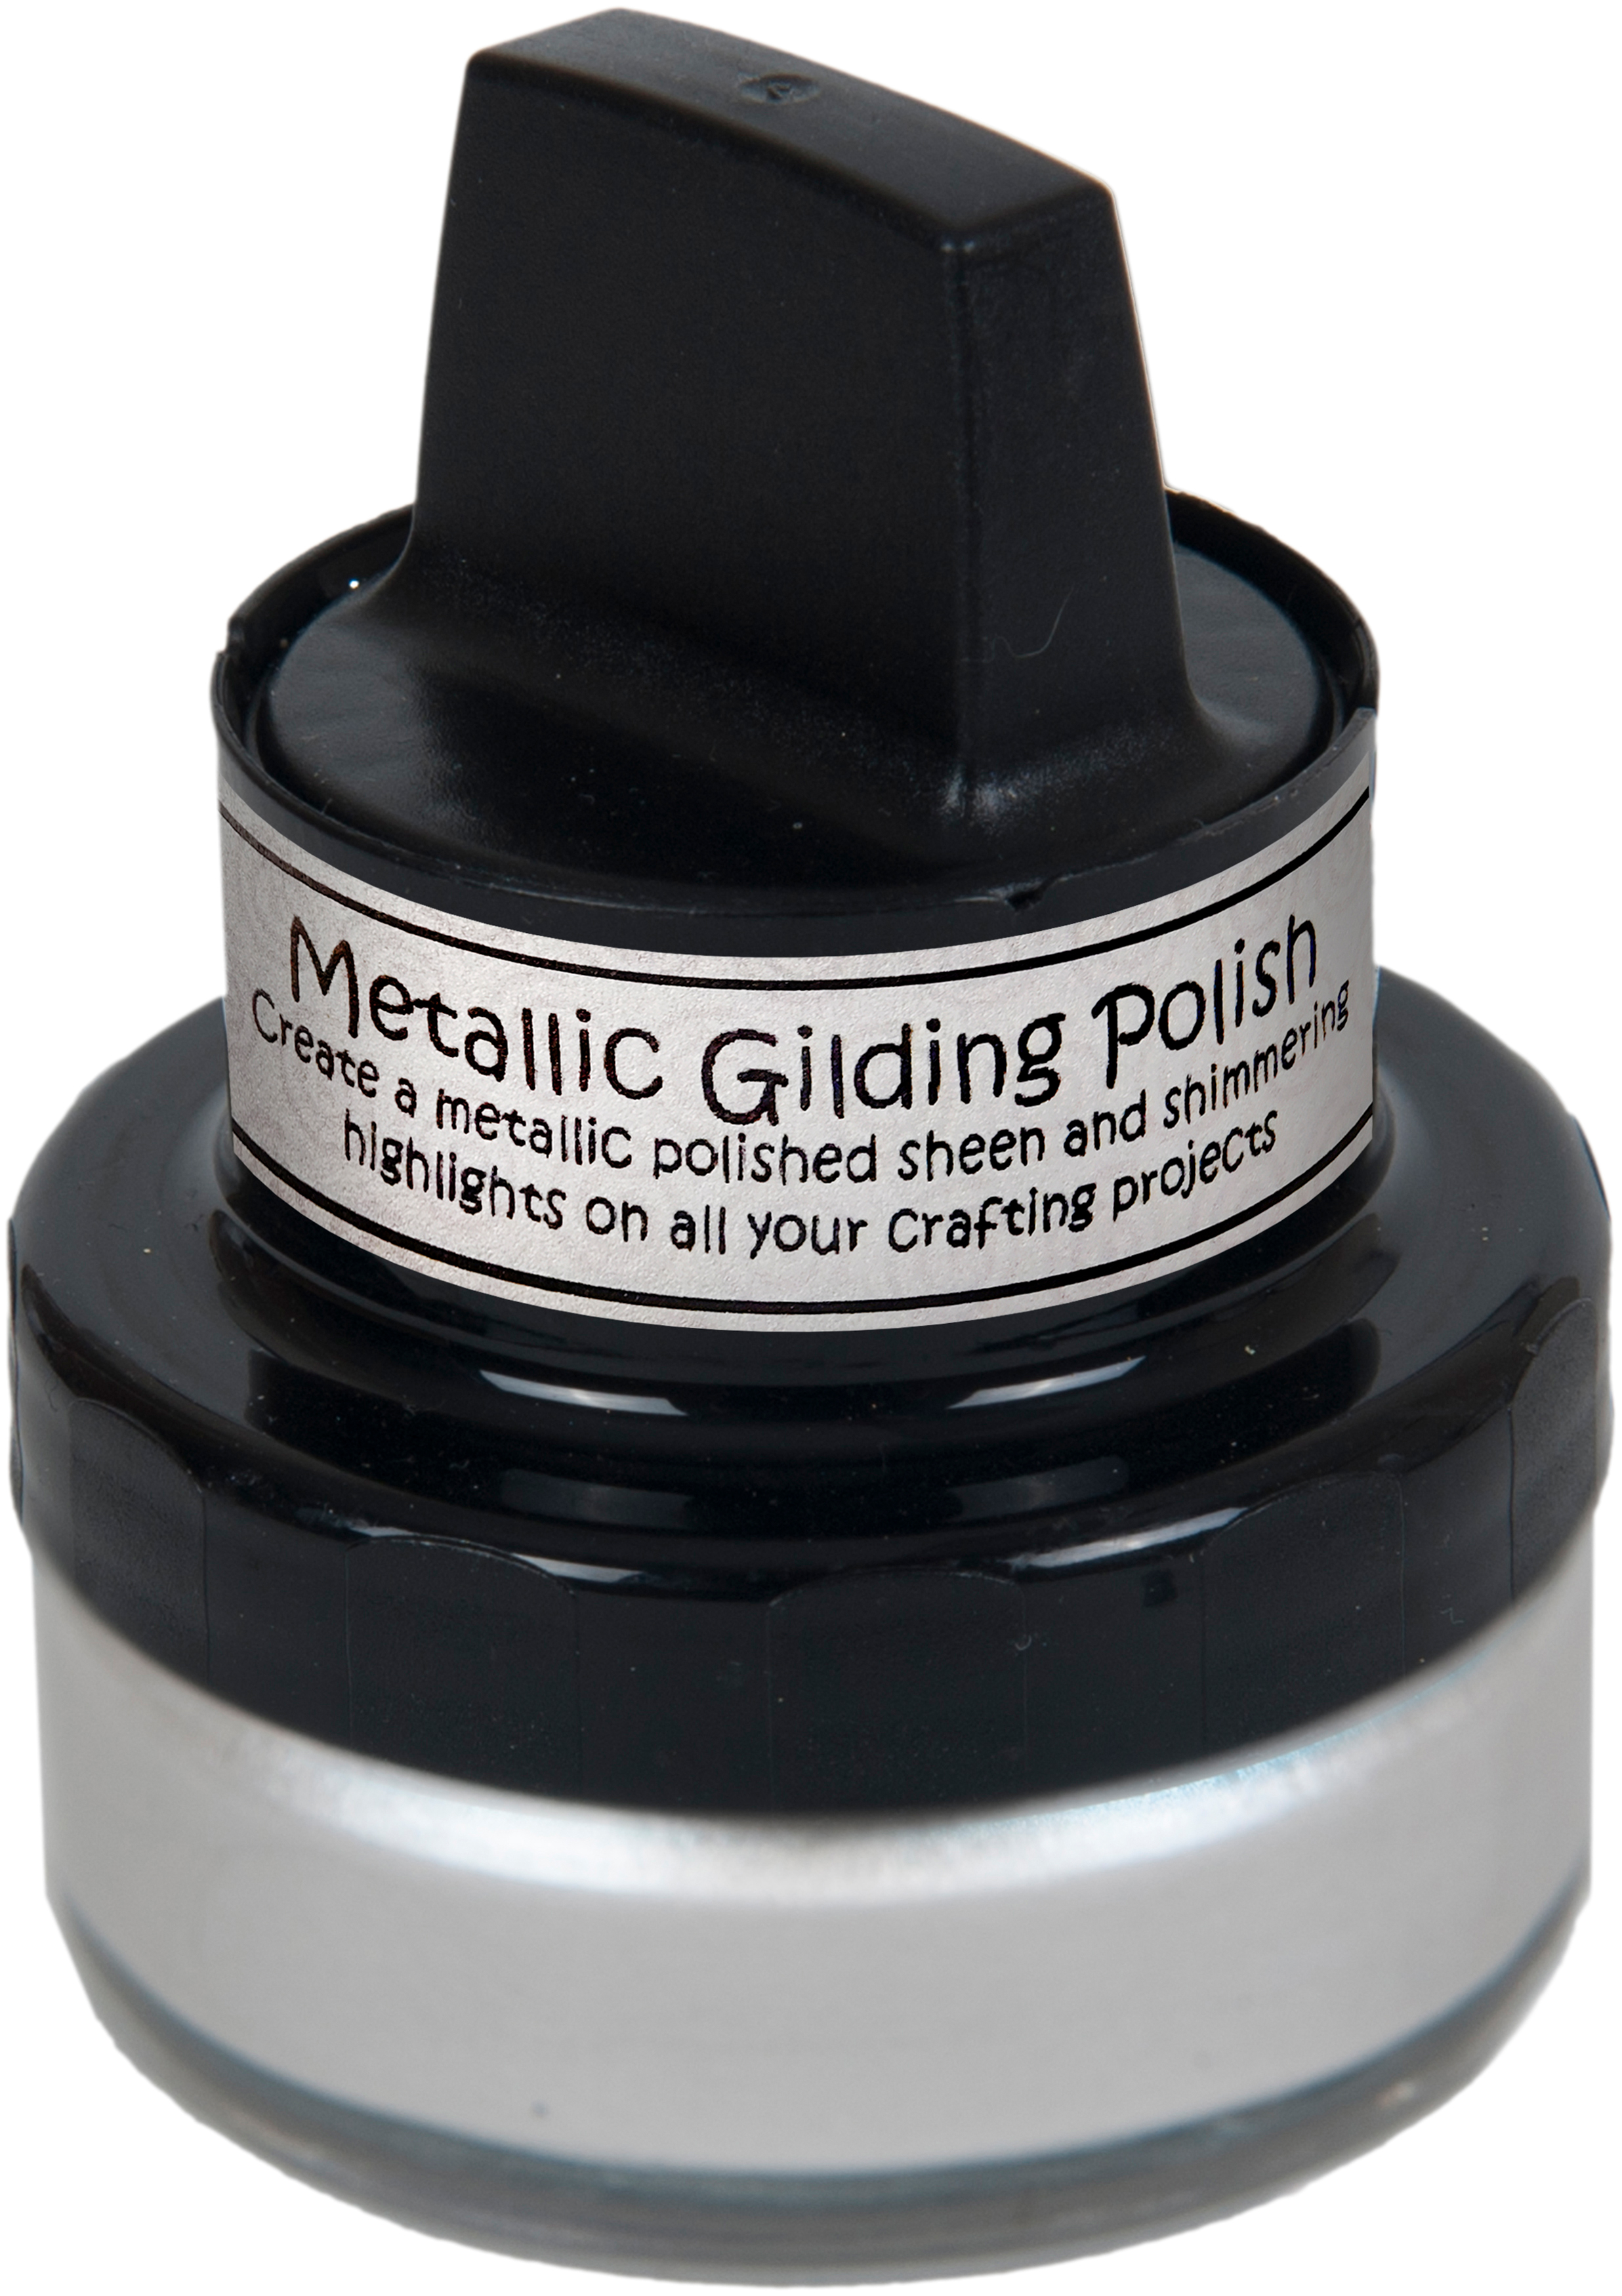 Cosmic Shimmer Metallic gilding polish pearl lustre